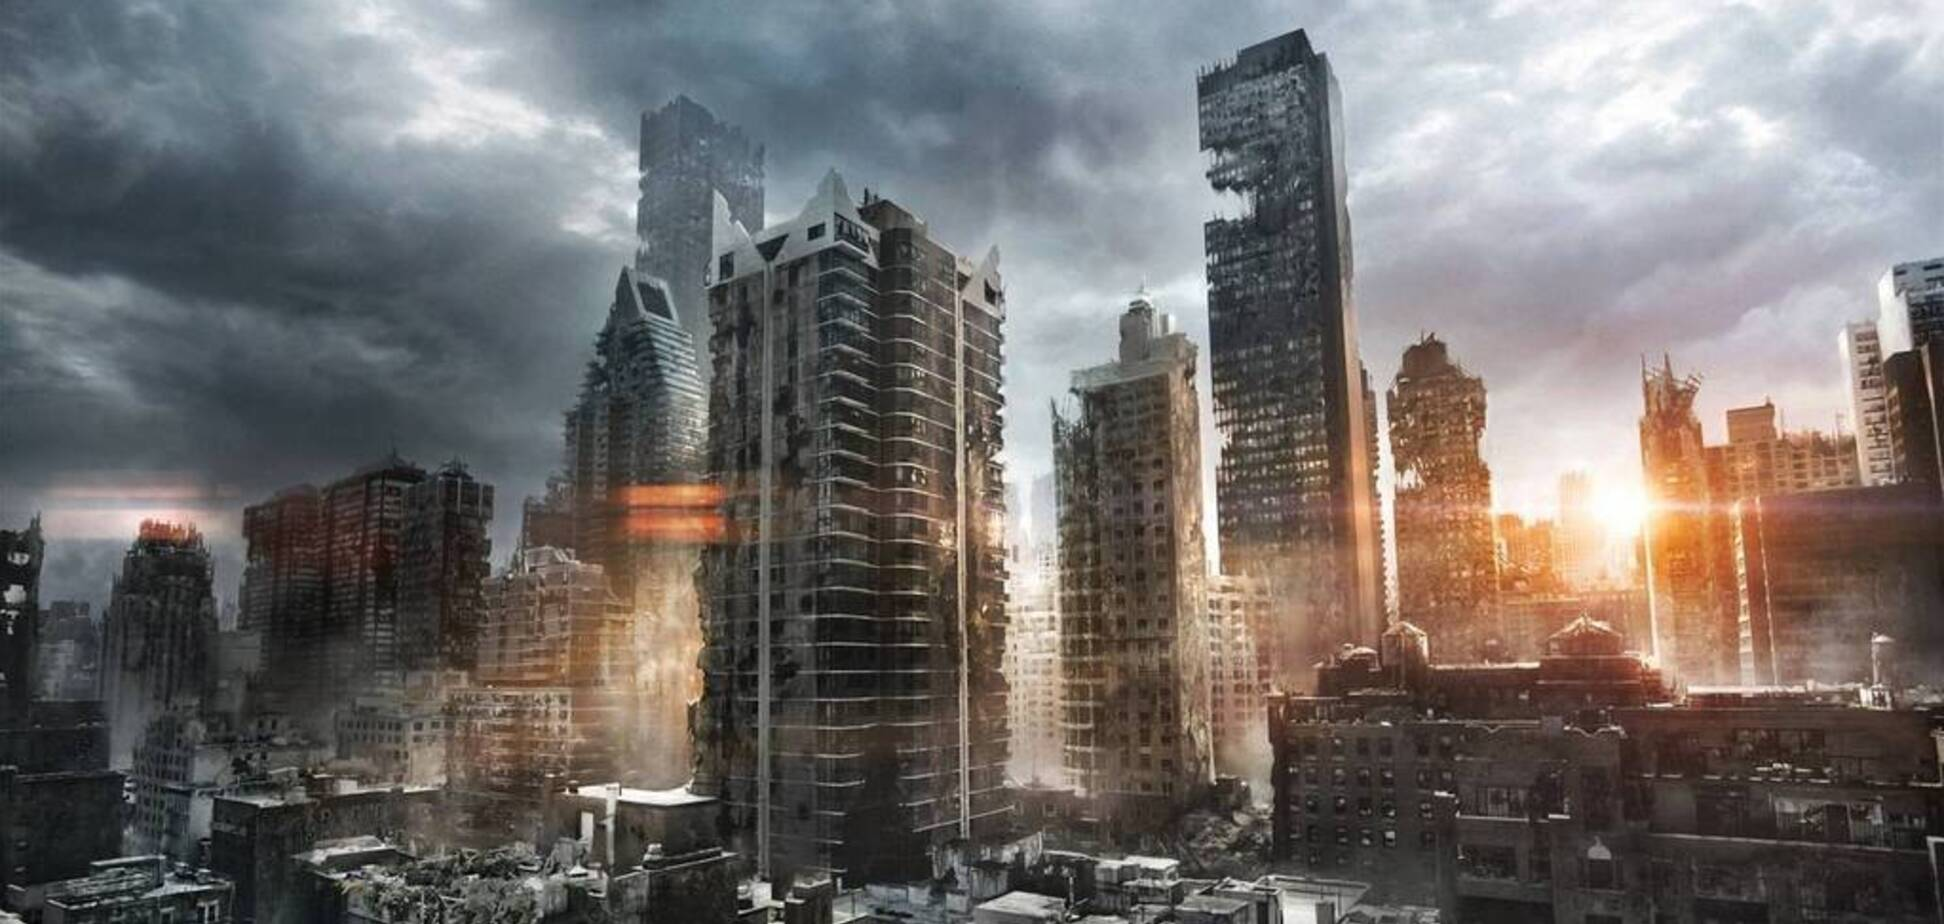 США знищить супервулкан? З'явилася розшифровка пророцтва Нострадамуса